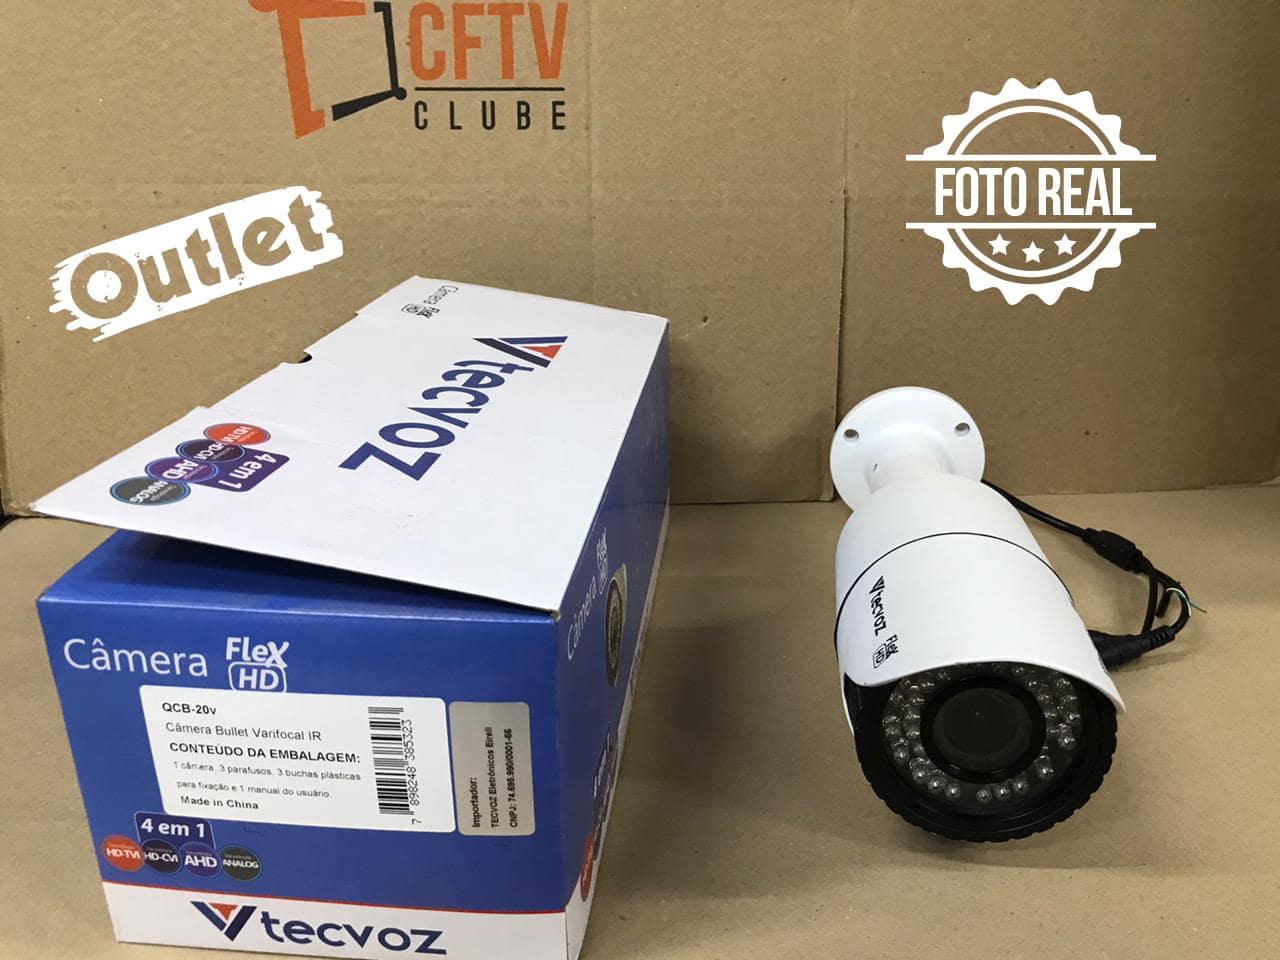 Outlet - Câmera Tecvoz Varifocal com Zoom Flex HD QCB-20v Full HD (2.0MP | 1080p | 2.8mm~12mm | Metal)  - CFTV Clube | Brasil